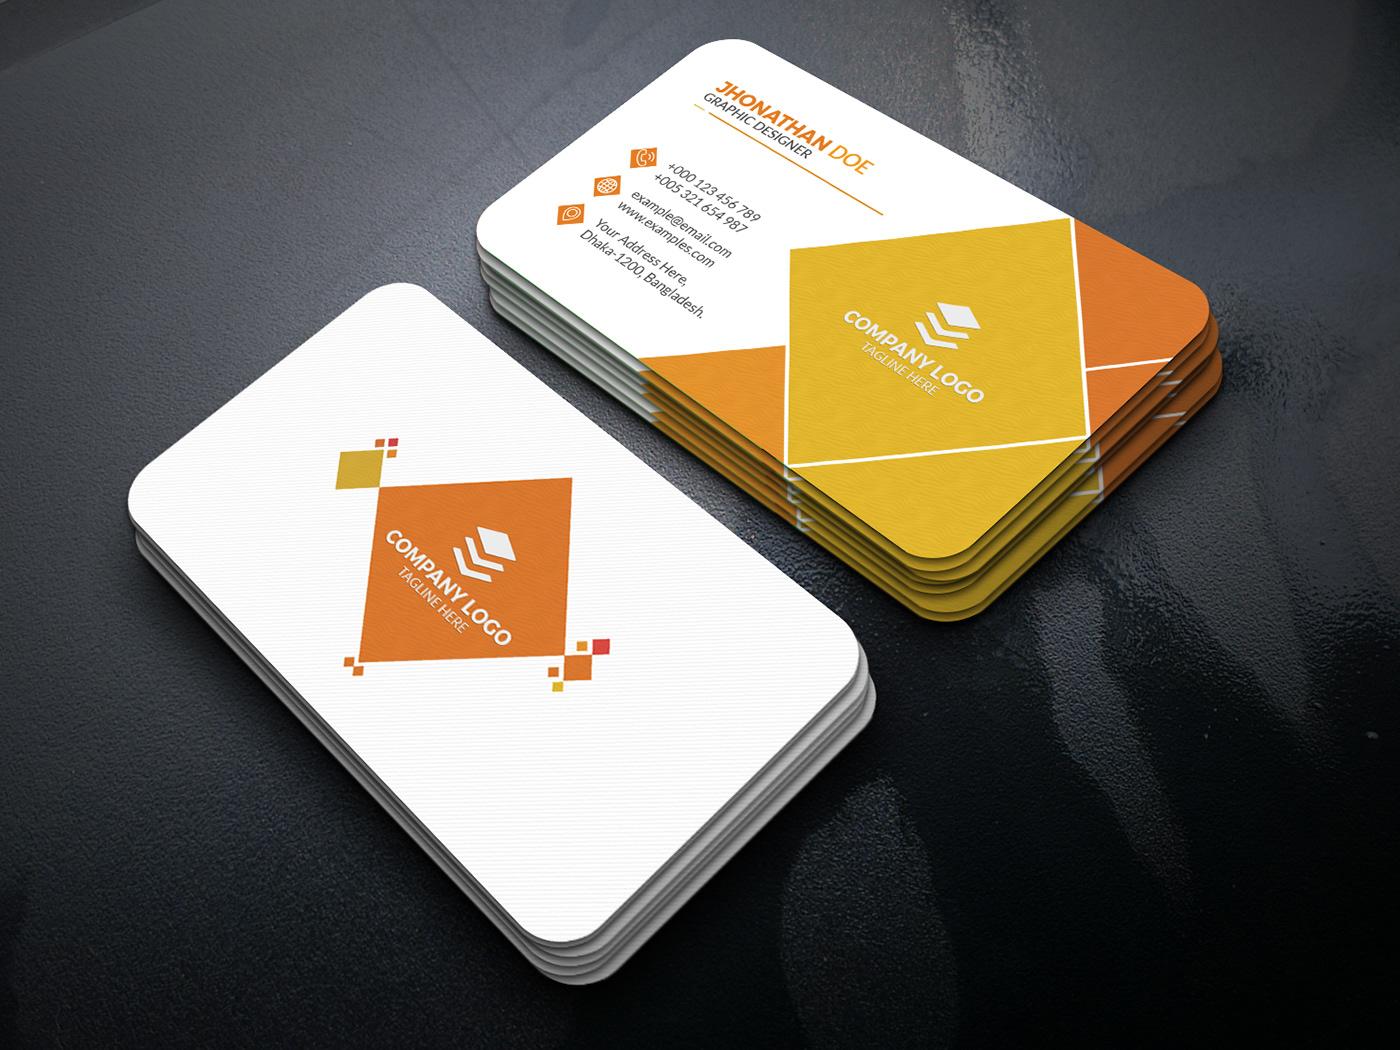 Business card design business card design ideas best business card Designs 2017 Free Business Cards templates business card template free download free